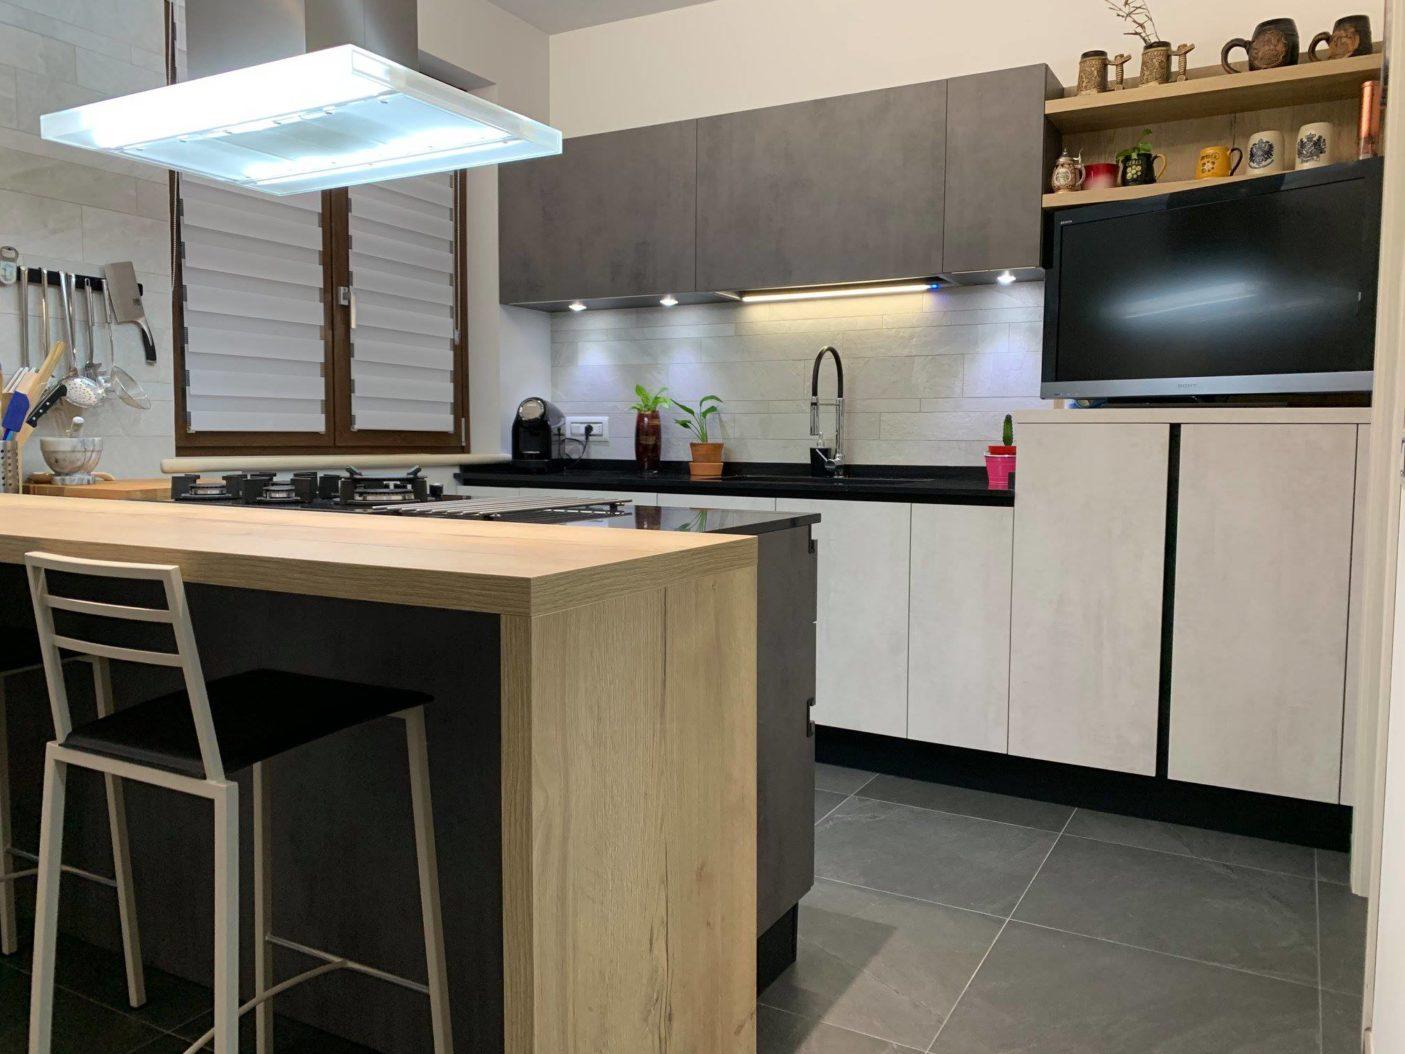 Cucina-Creo-Kitchens-Tablet-Personalizzata1-1.jpg